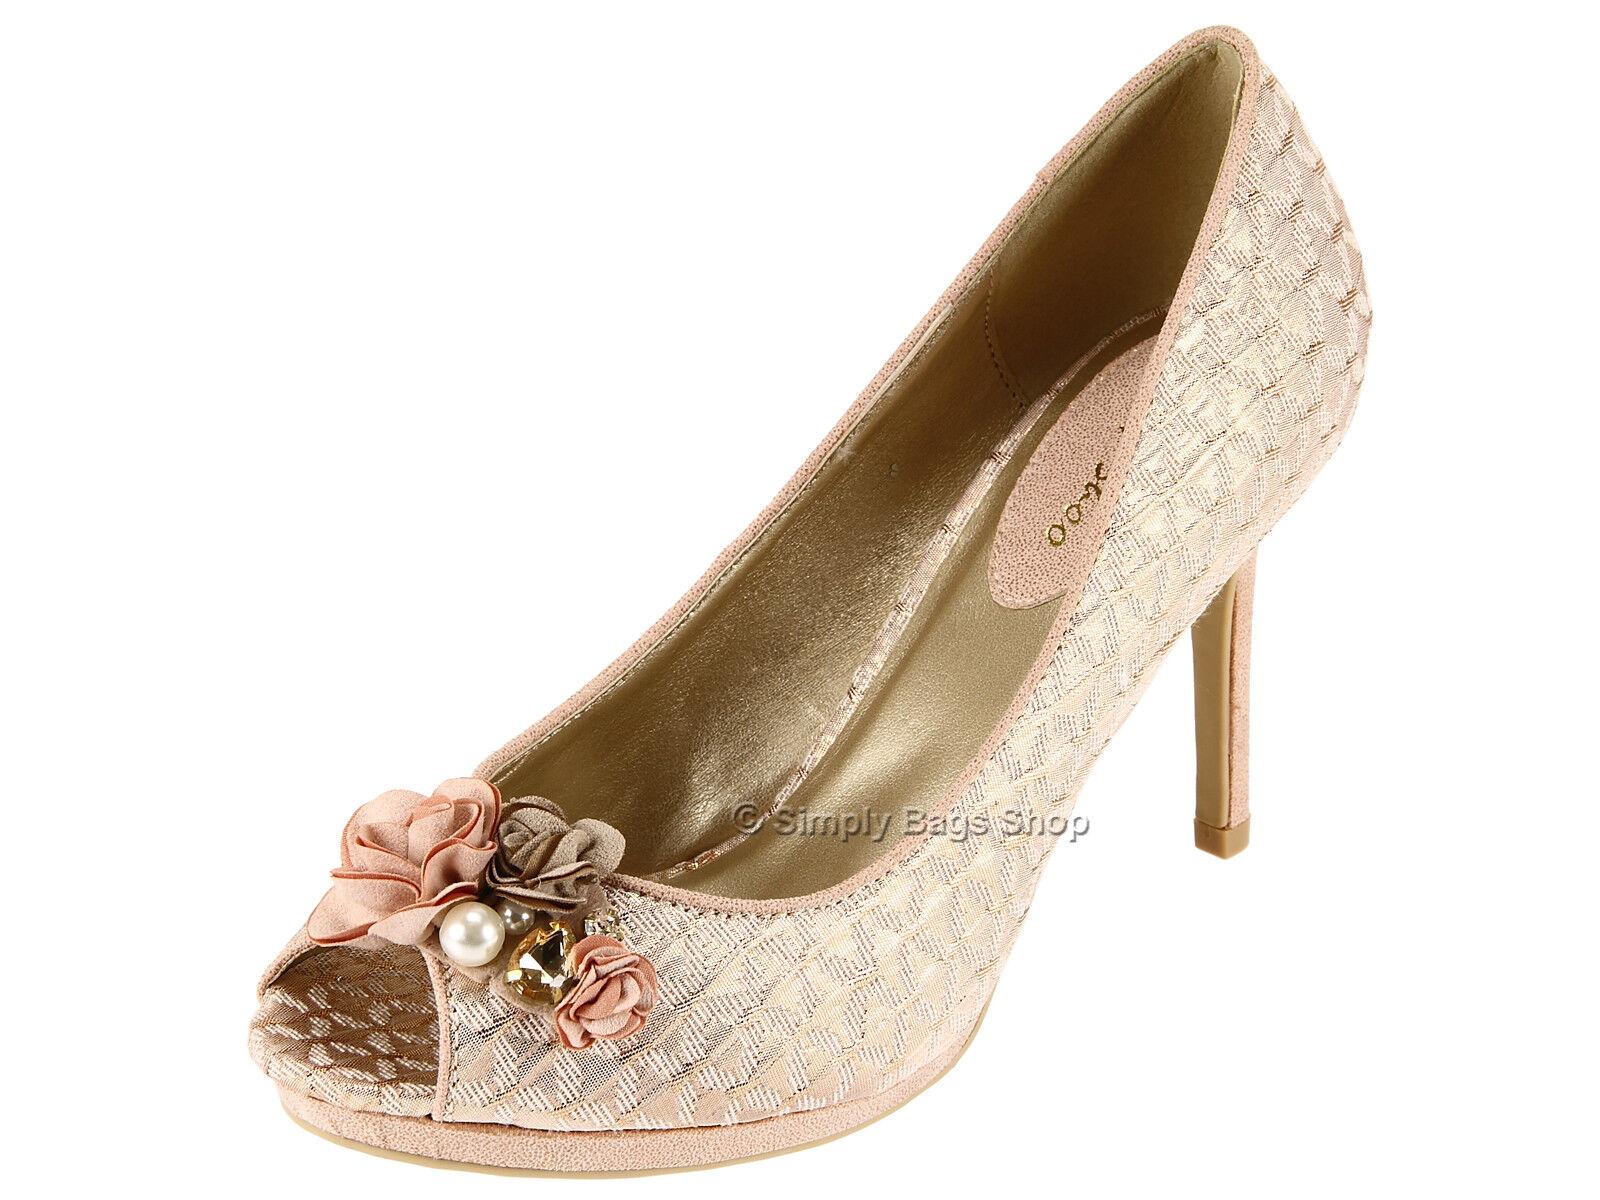 Ruby Shoo Donna Vegan cordiale Peeptoe Tacco Alto   Formale Matrimonio Oro Rosa